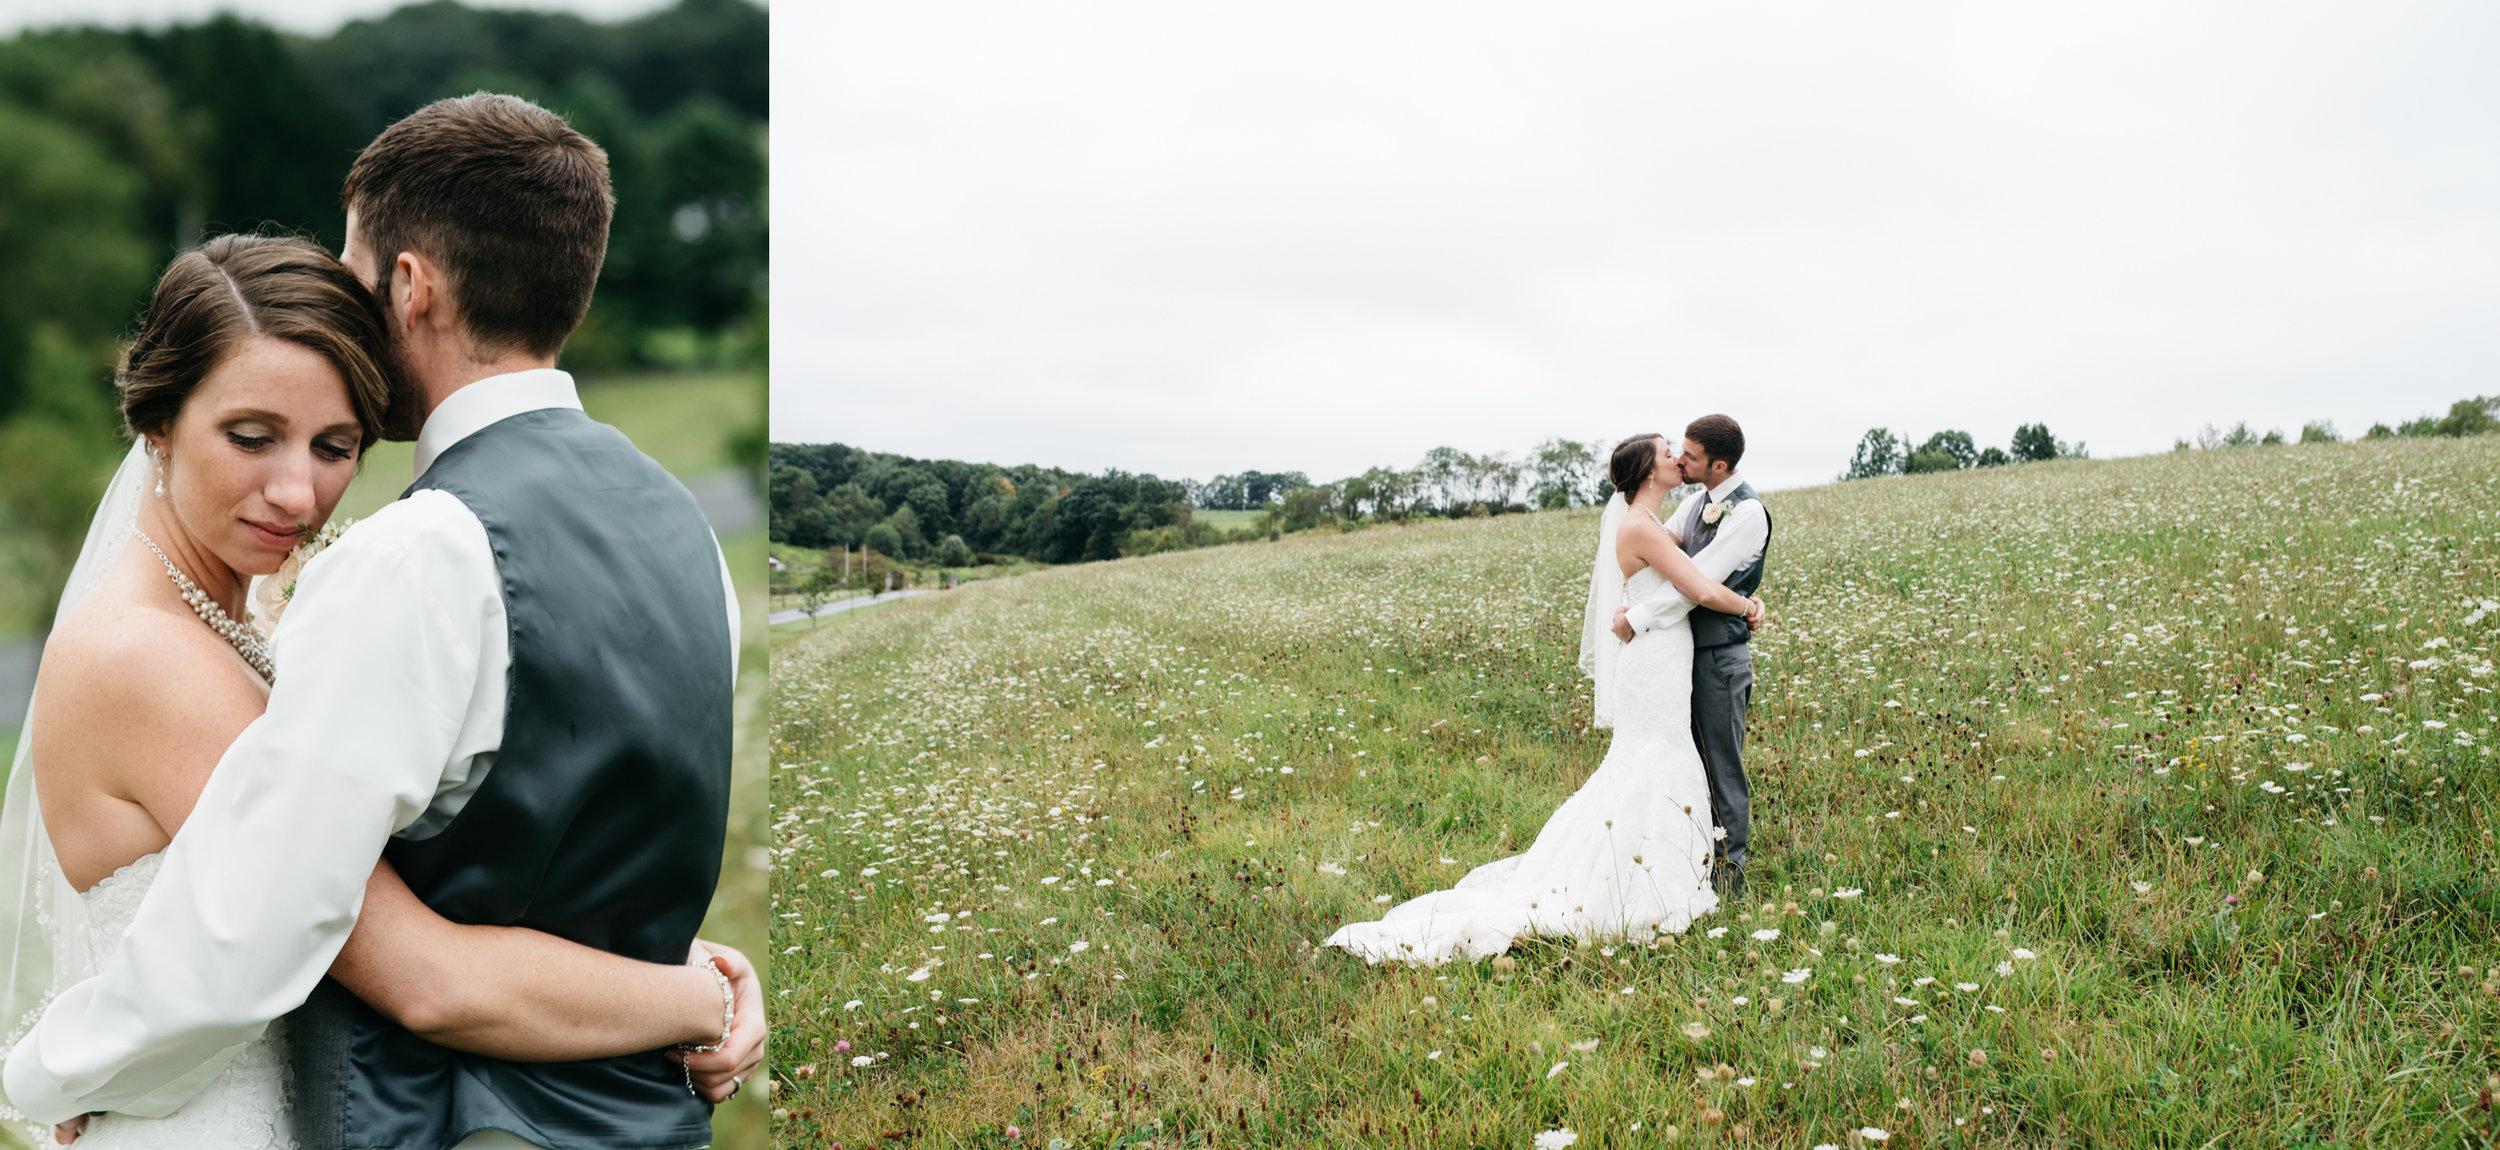 Mariah Fisher photography pittsburgh and ligonier wedding photographer +the Hayloft.jpg